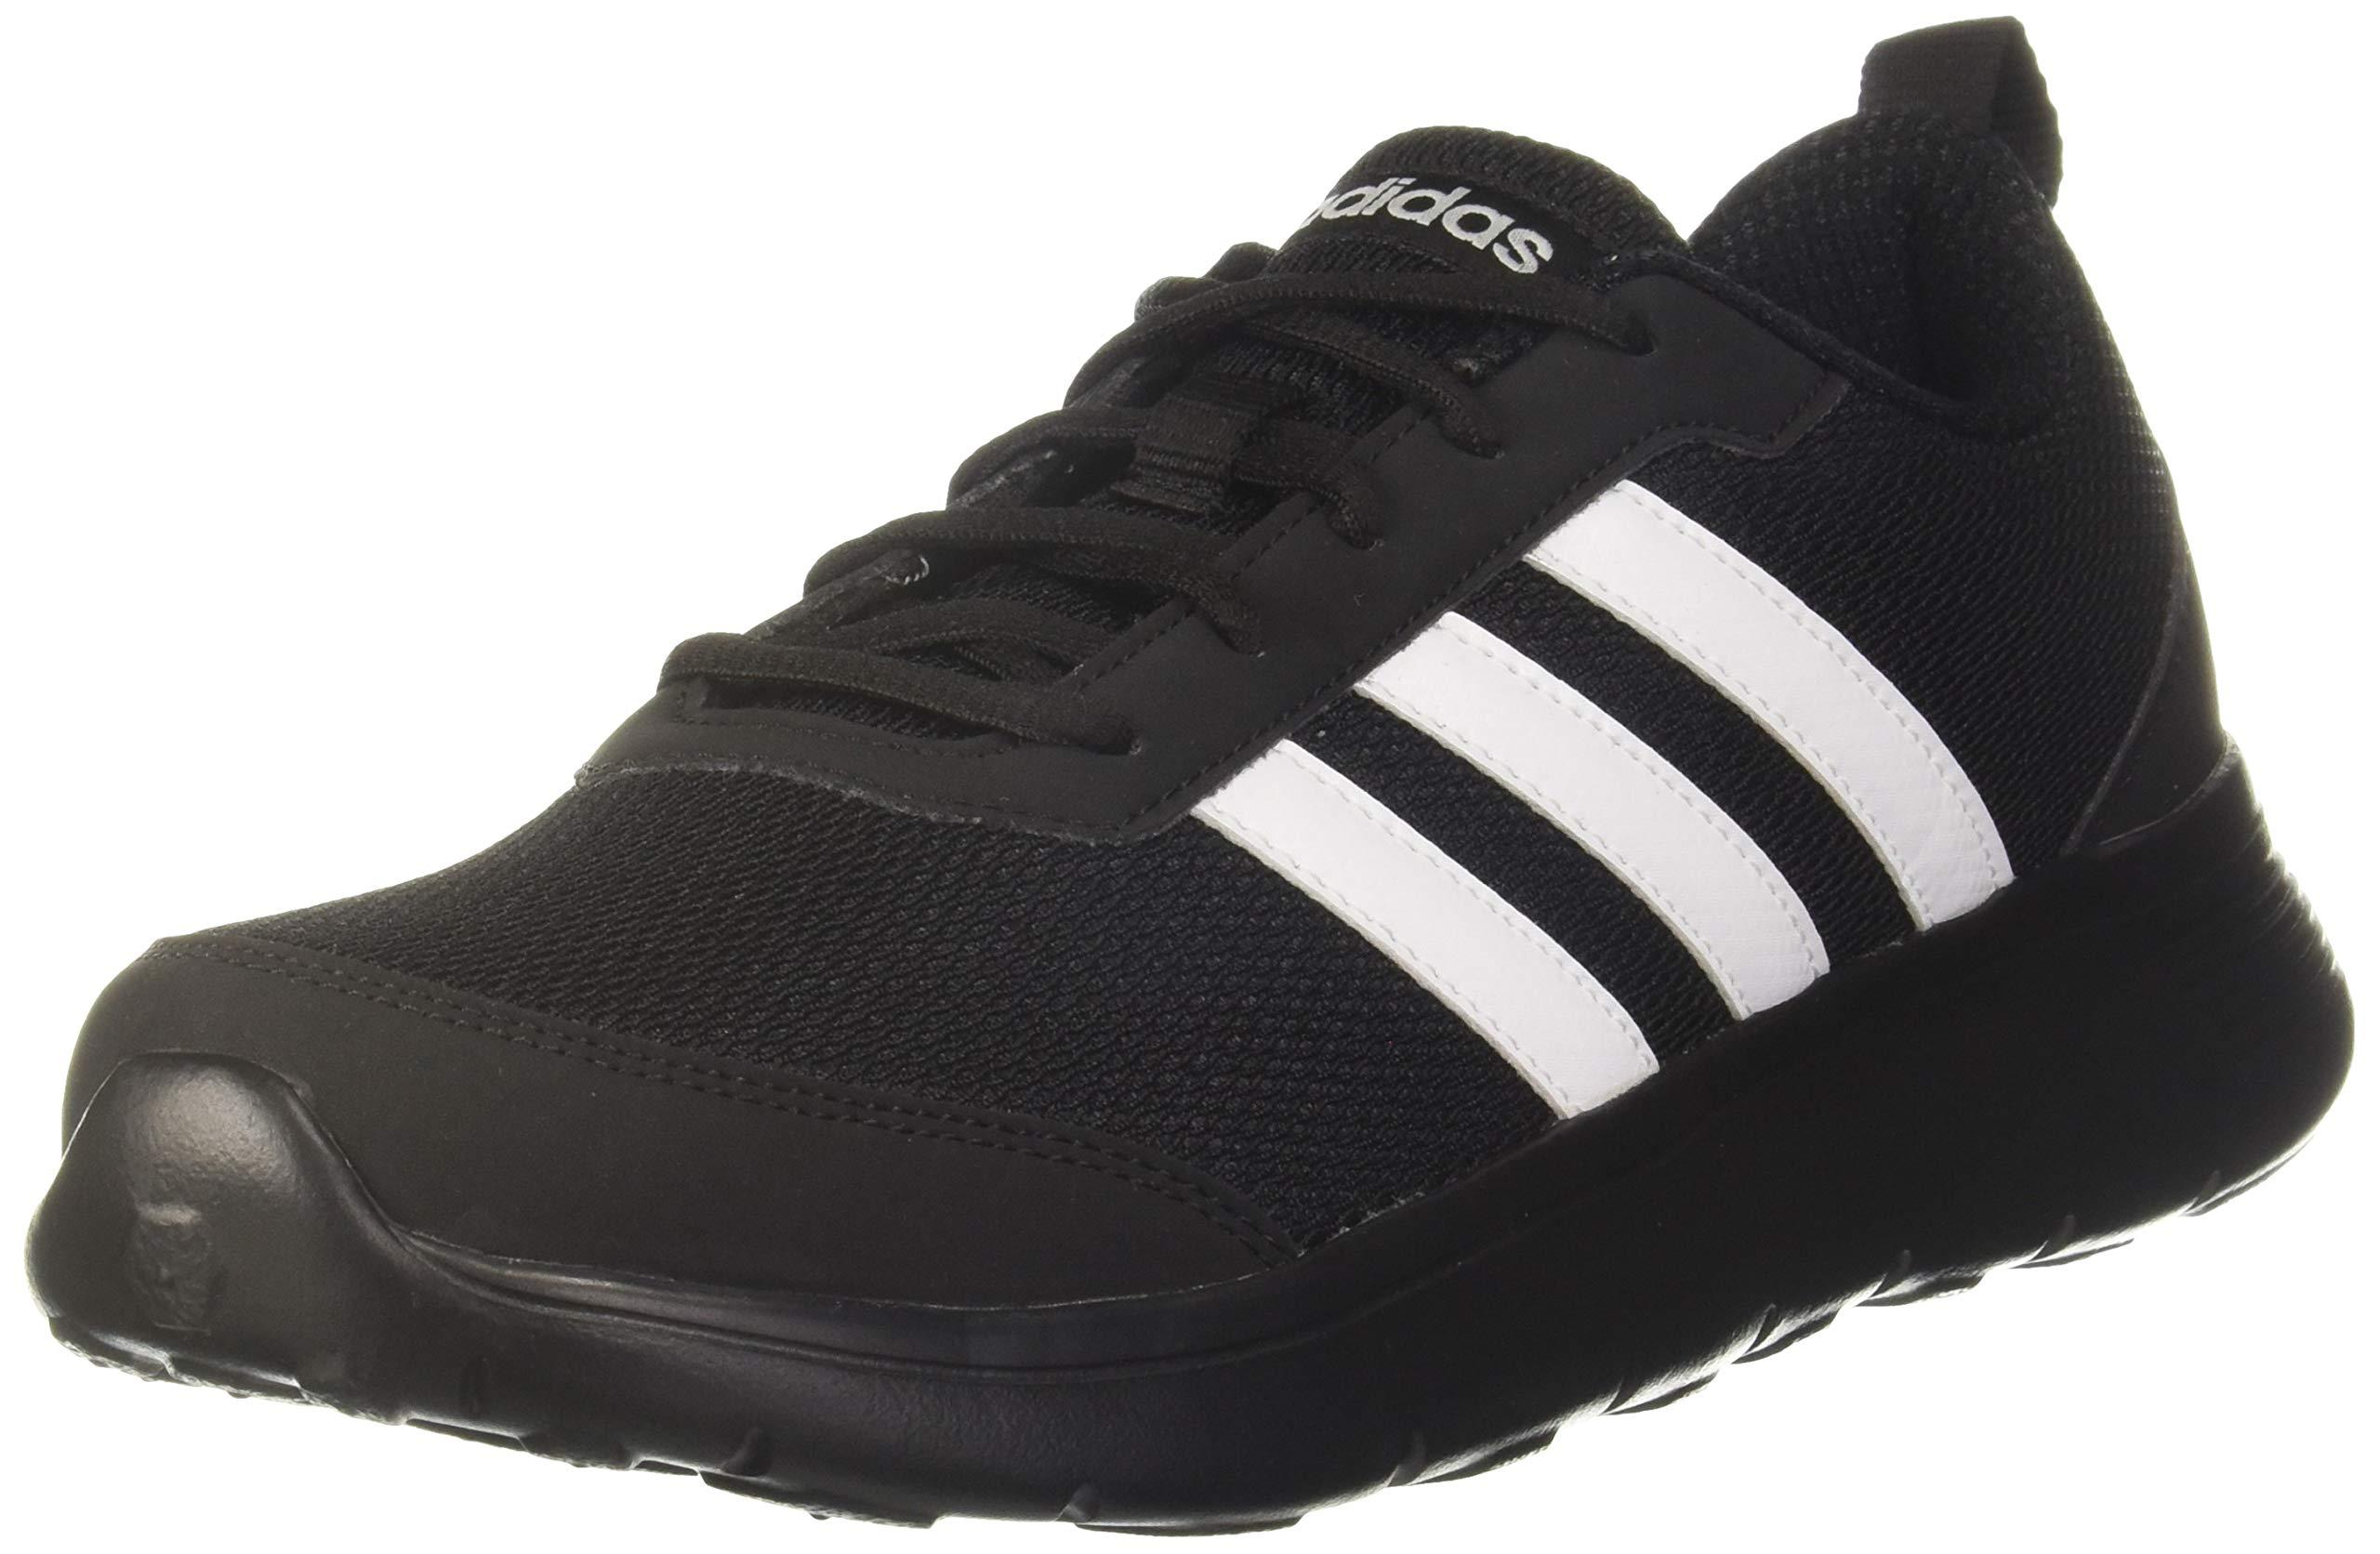 Hyperon 1.0 M Running Shoes